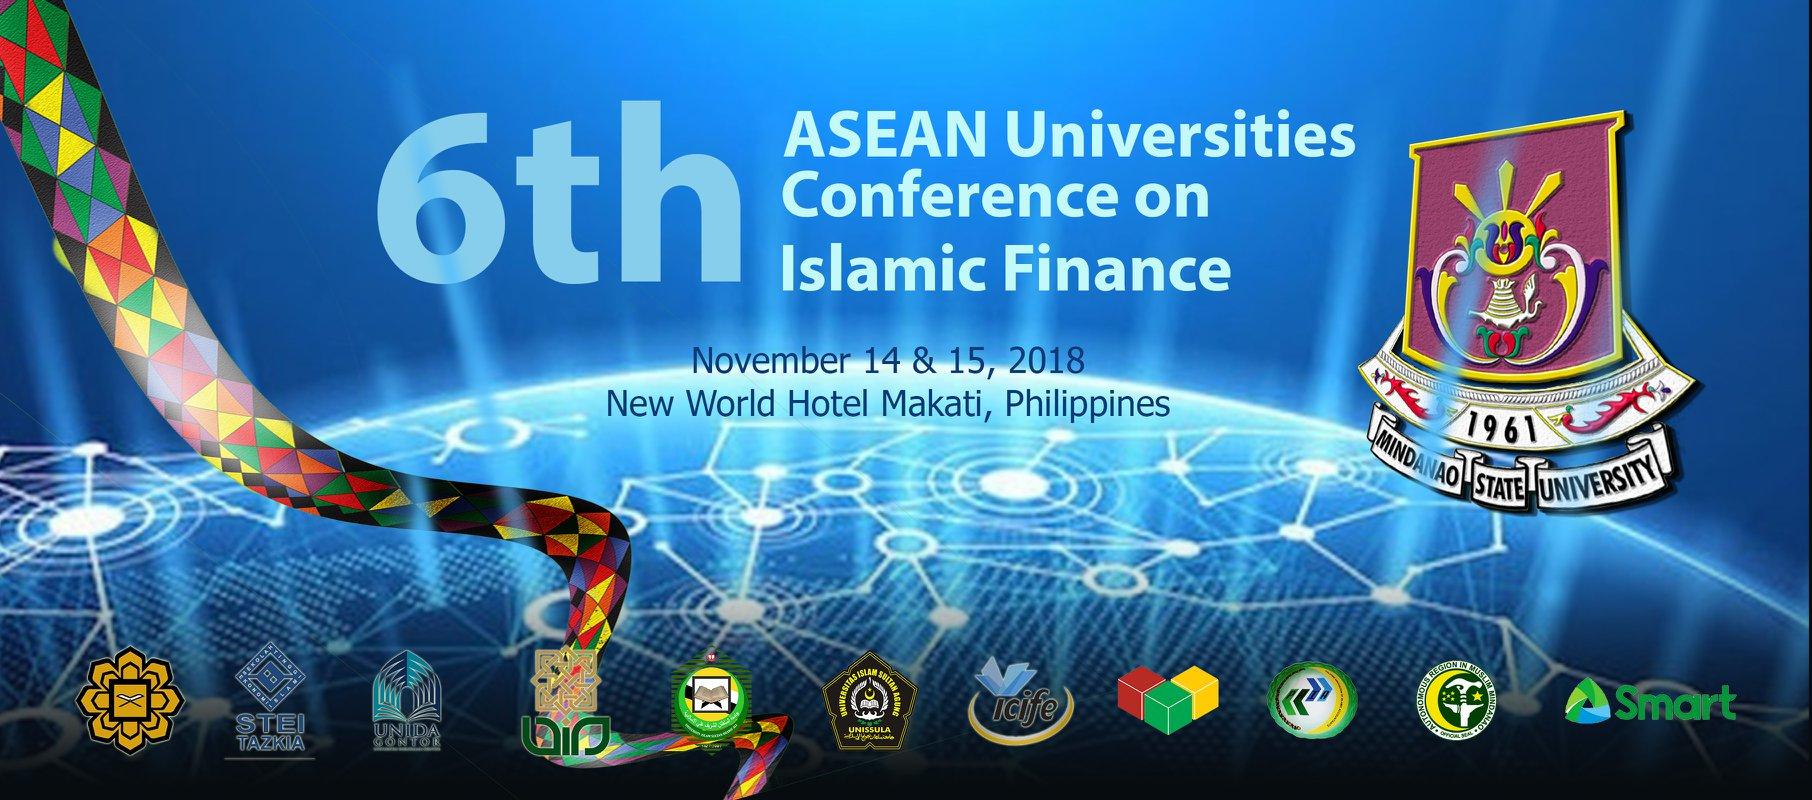 ASEAN educators, experts to discuss blockchain tech for Sukuk financing